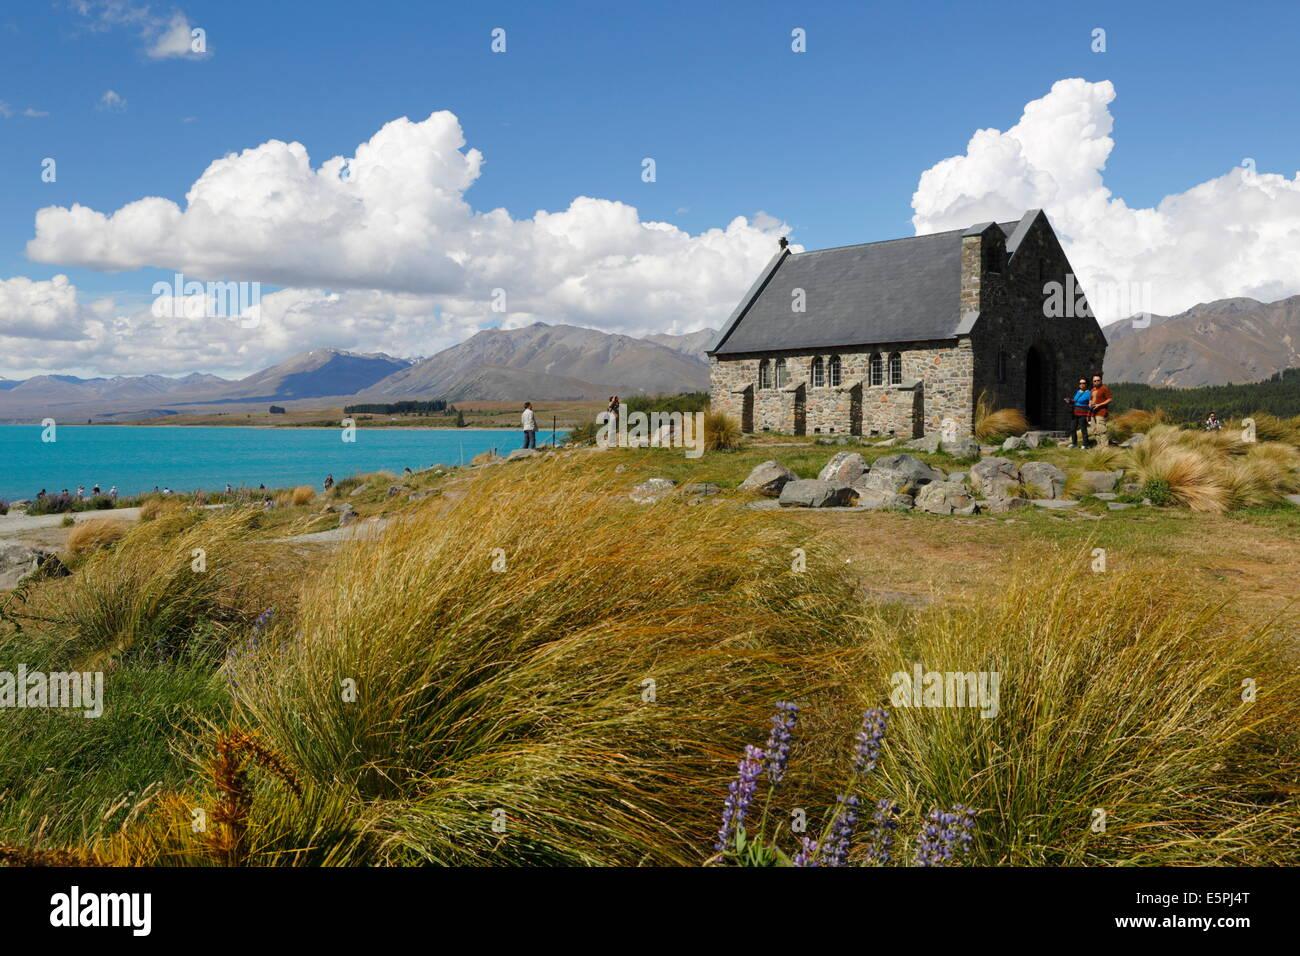 Church of the Good Shepherd, Lake Tekapo, Canterbury region, South Island, New Zealand, Pacific - Stock Image